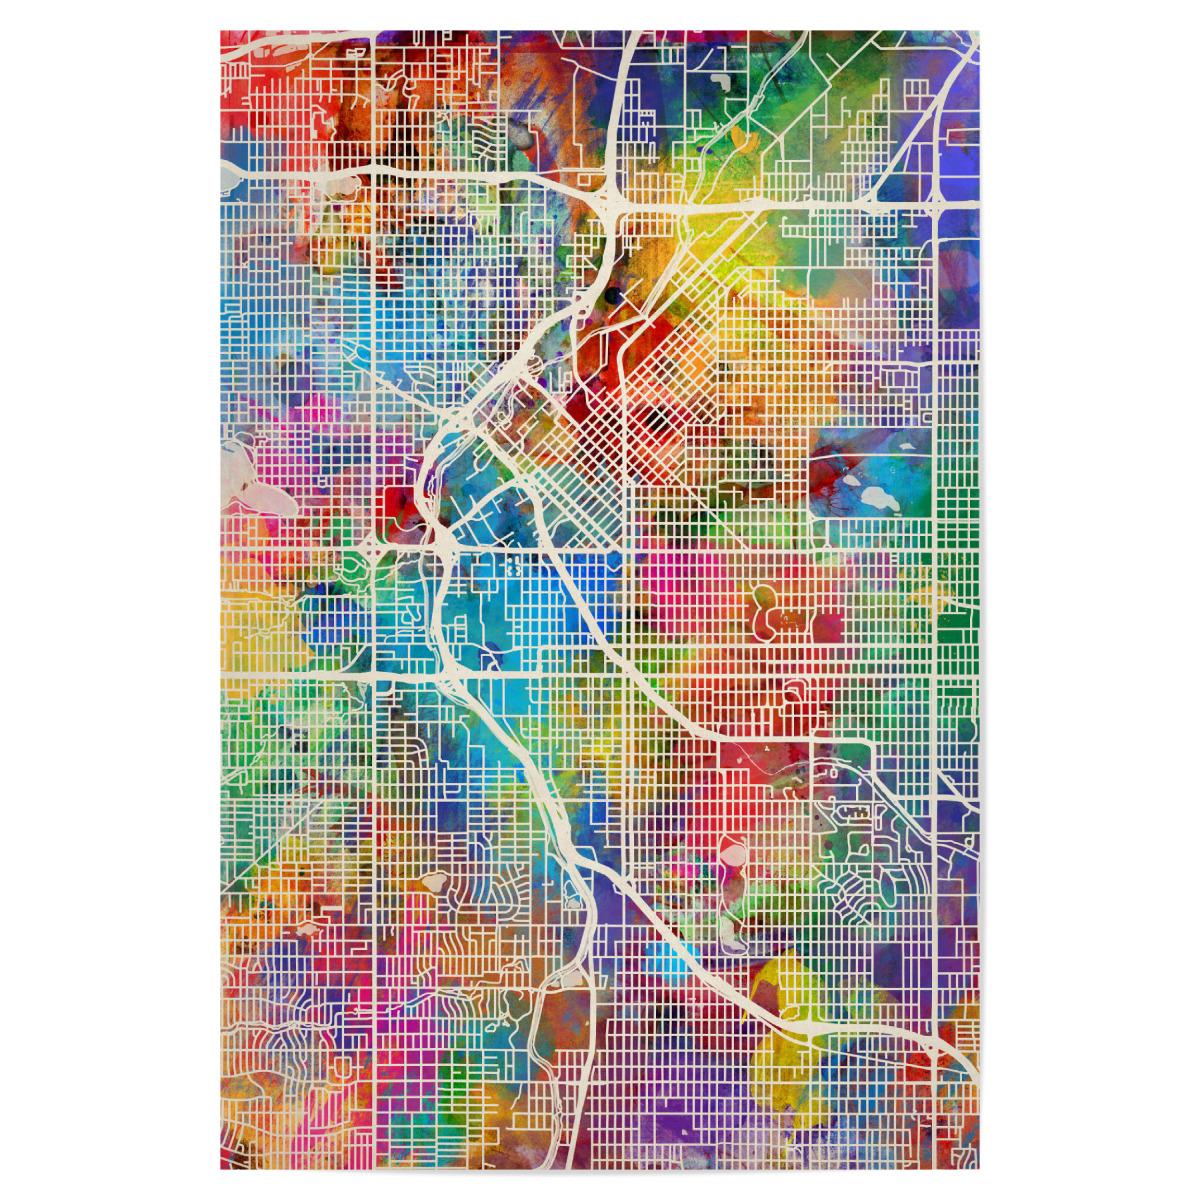 Denver Colorado Street Map als Poster bei artboxONE kaufen on